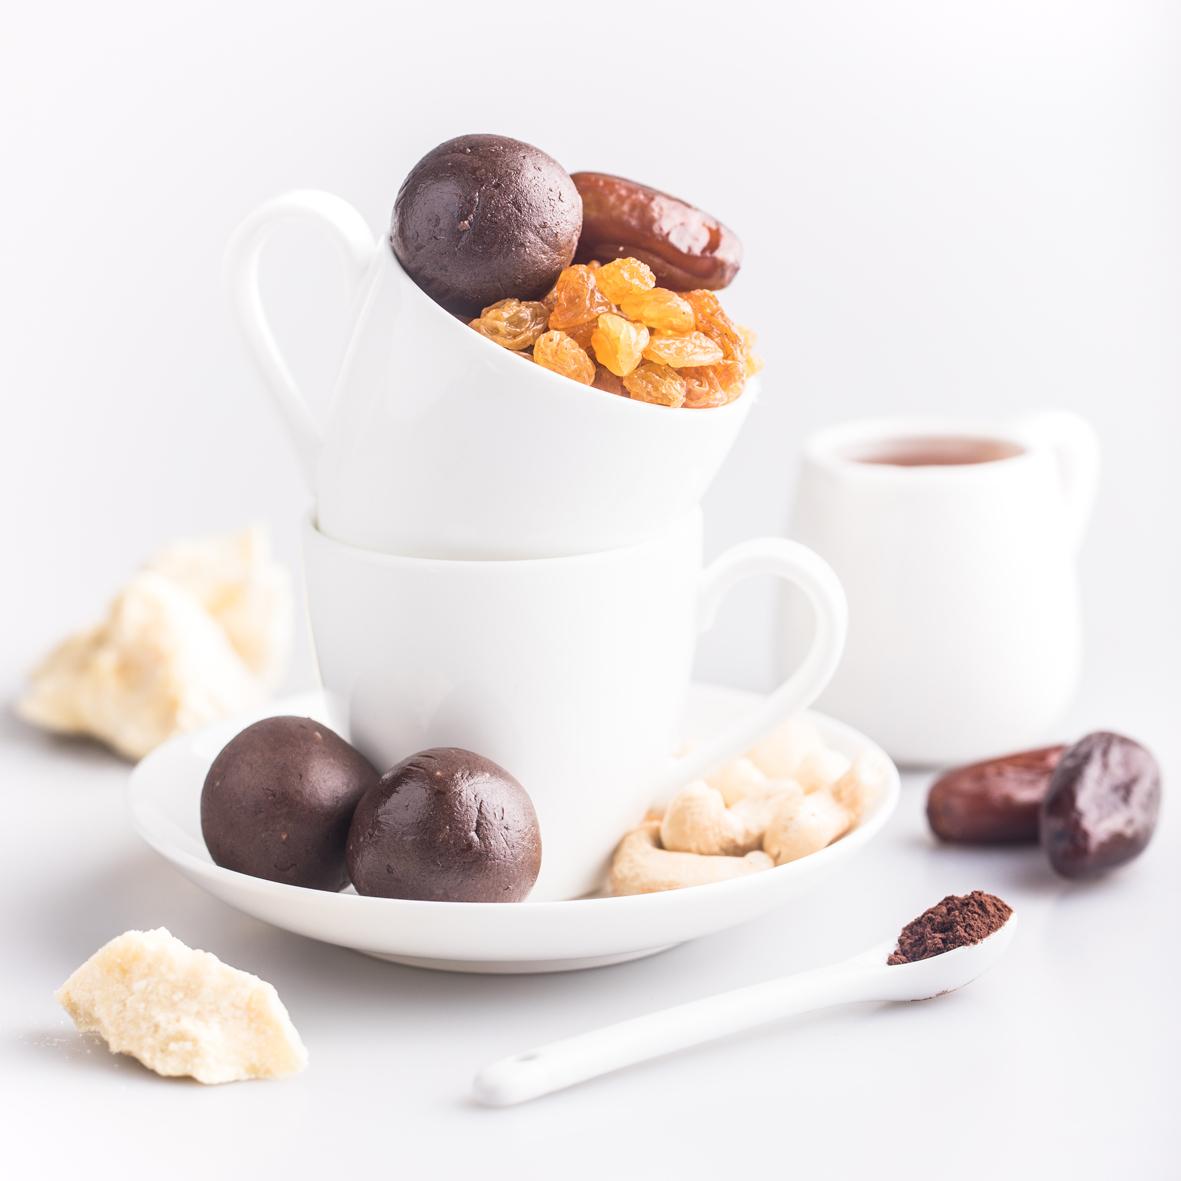 Полезная конфета Protein Ball. Шоколад (2 конфеты) 30 гр.